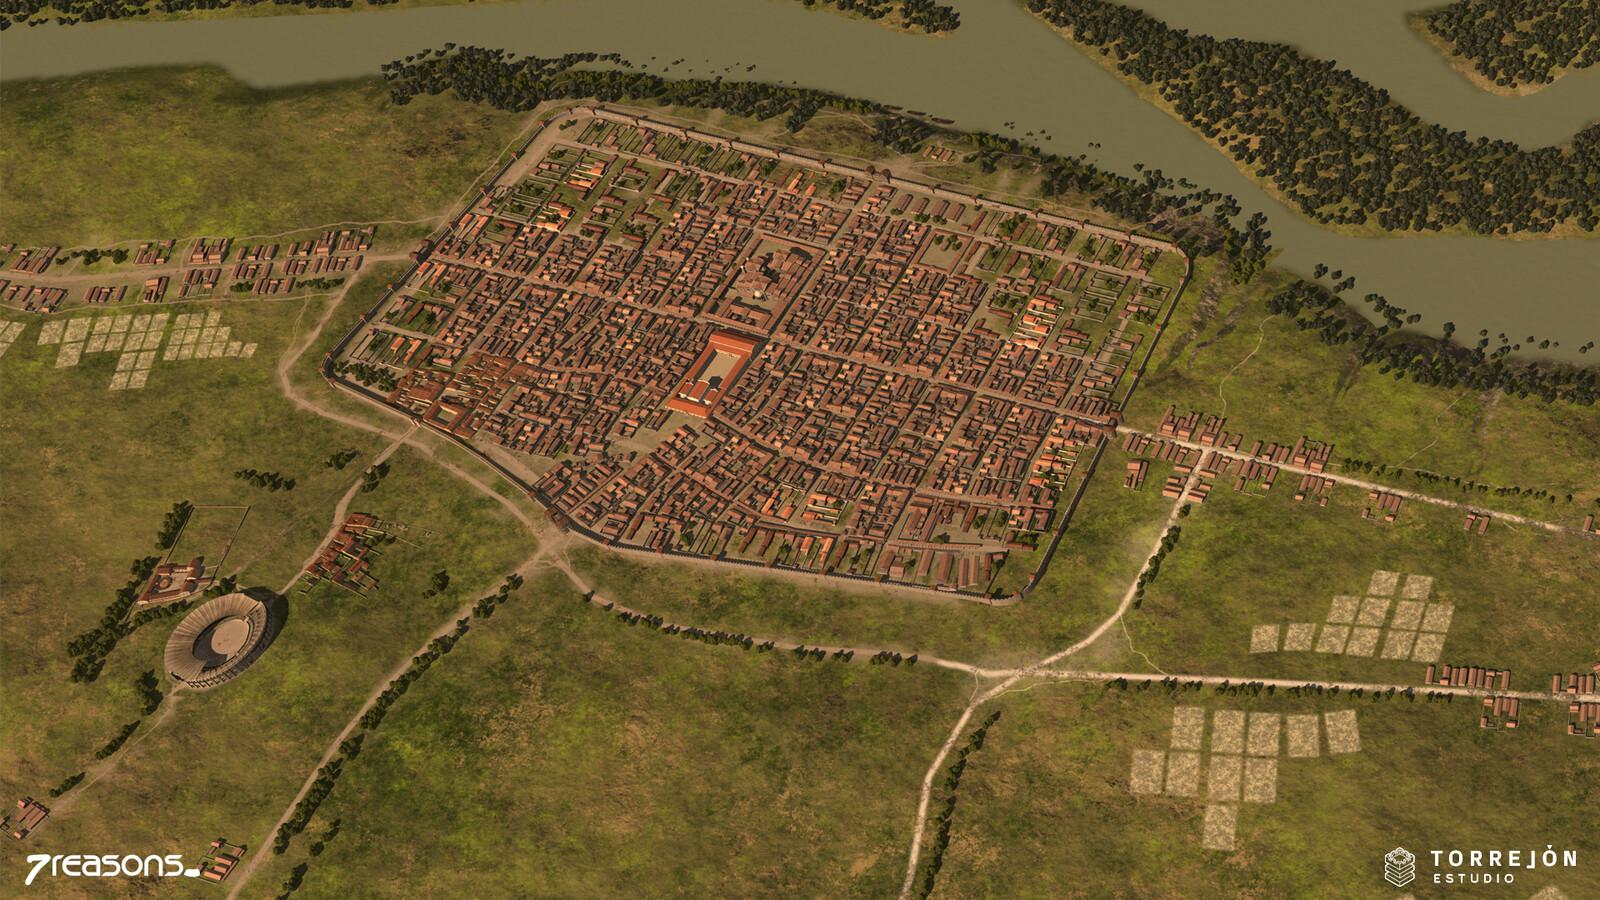 Carnuntum - Civil town 3D visualisation